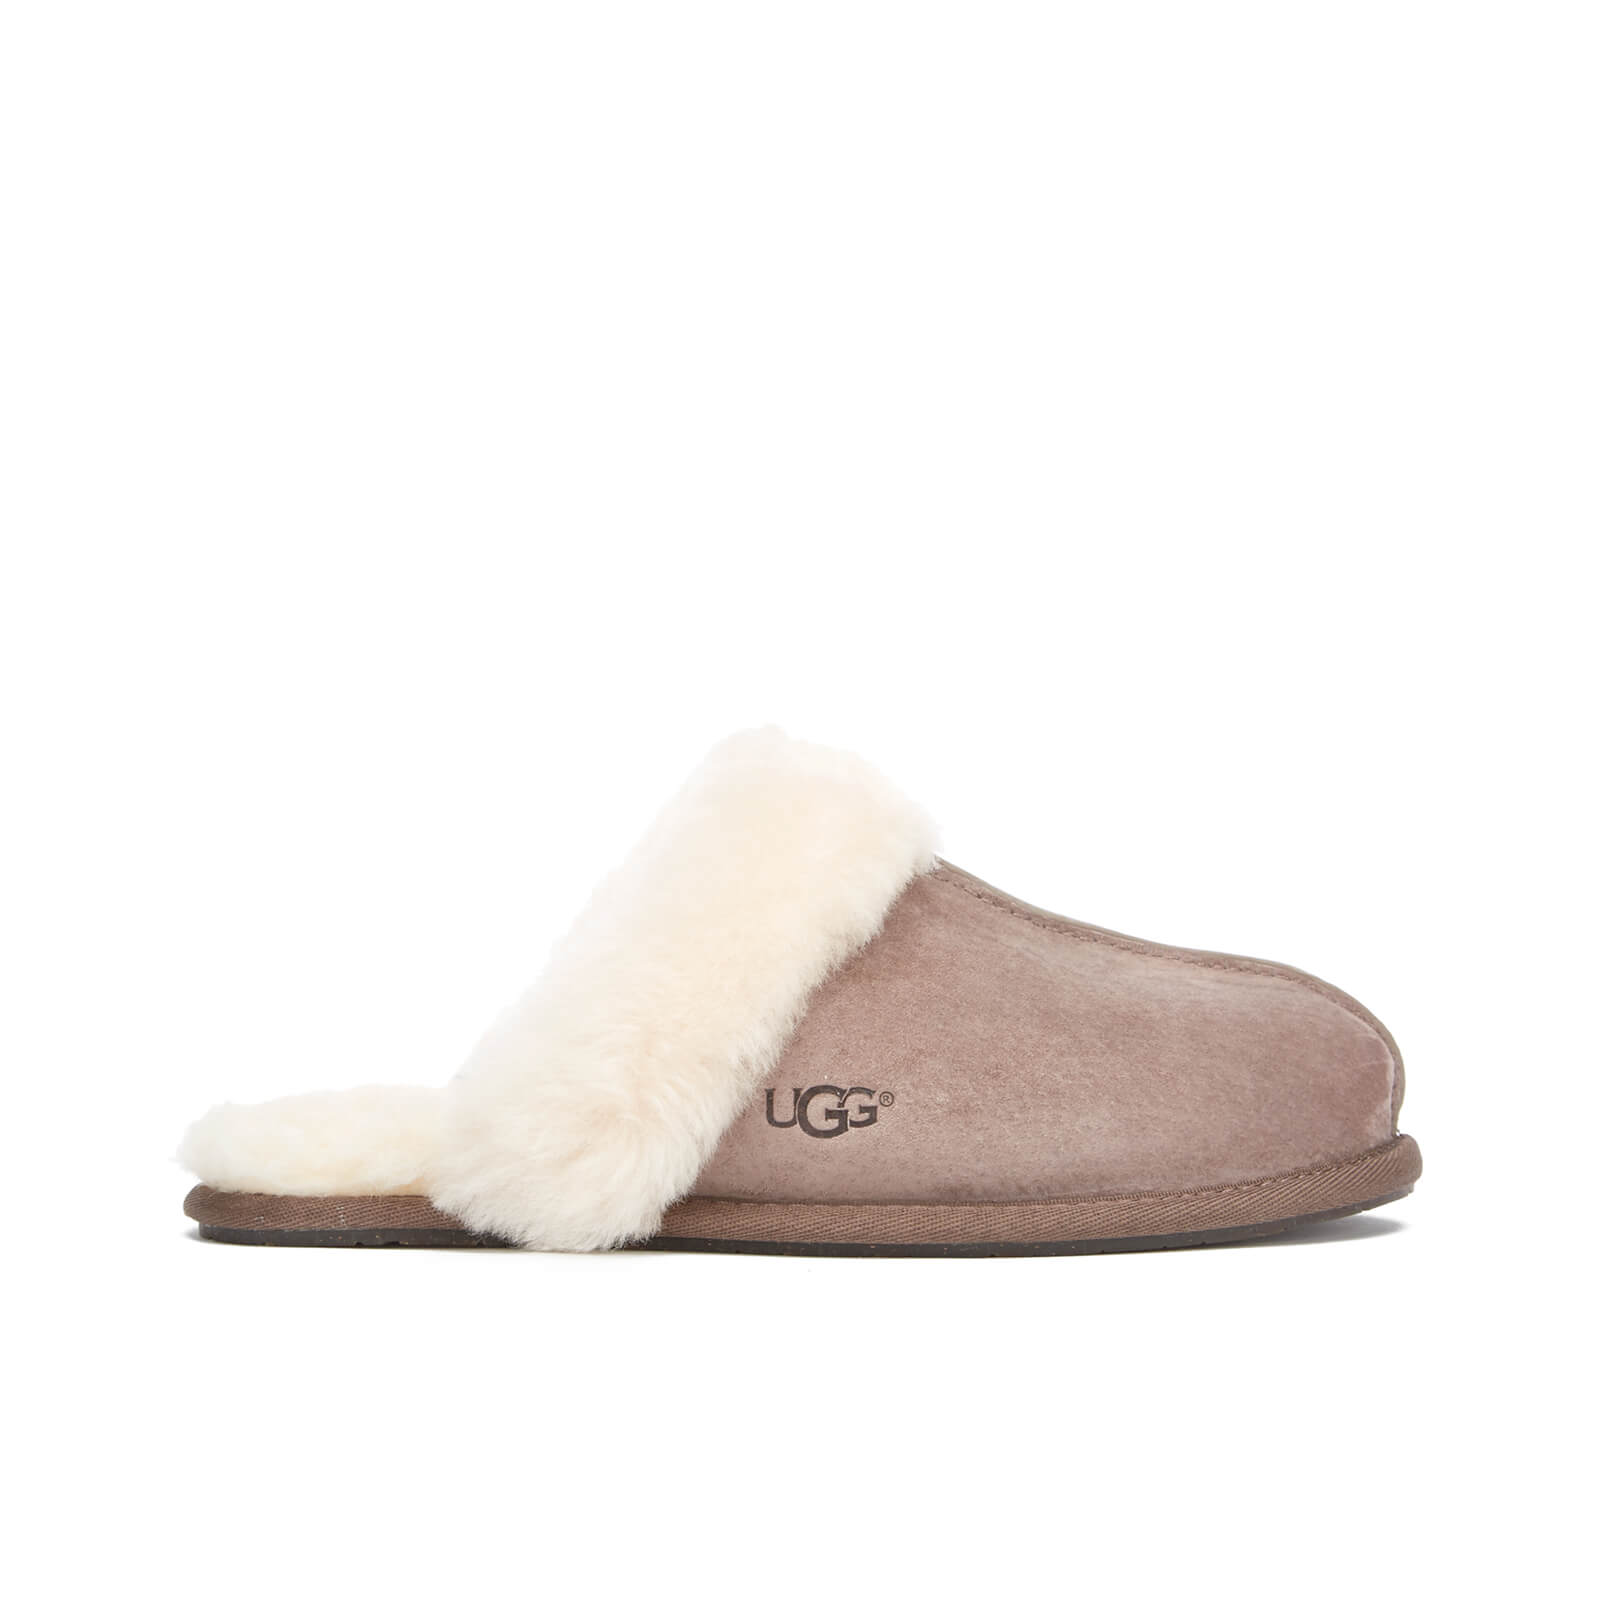 fa993f9f59a UGG Women's Scuffette II Sheepskin Slippers - Stormy Grey